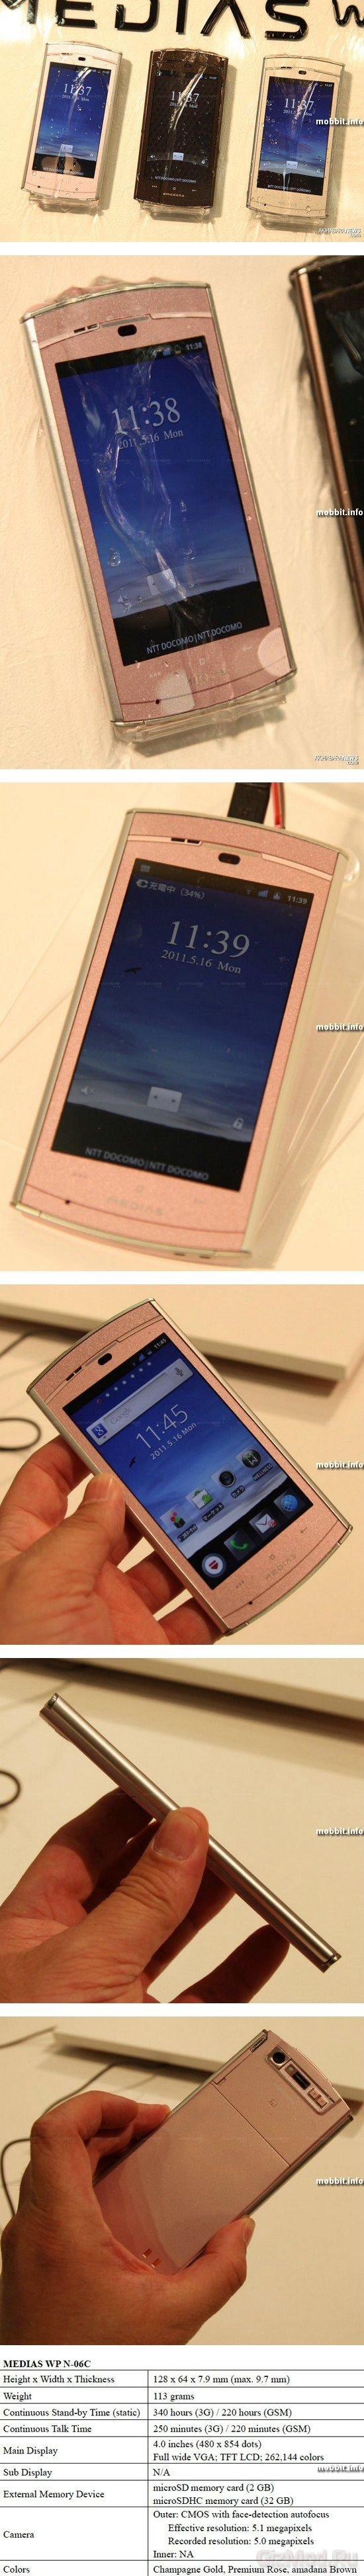 Водонепроницаемый смартфон Nec Medias WP N-06C